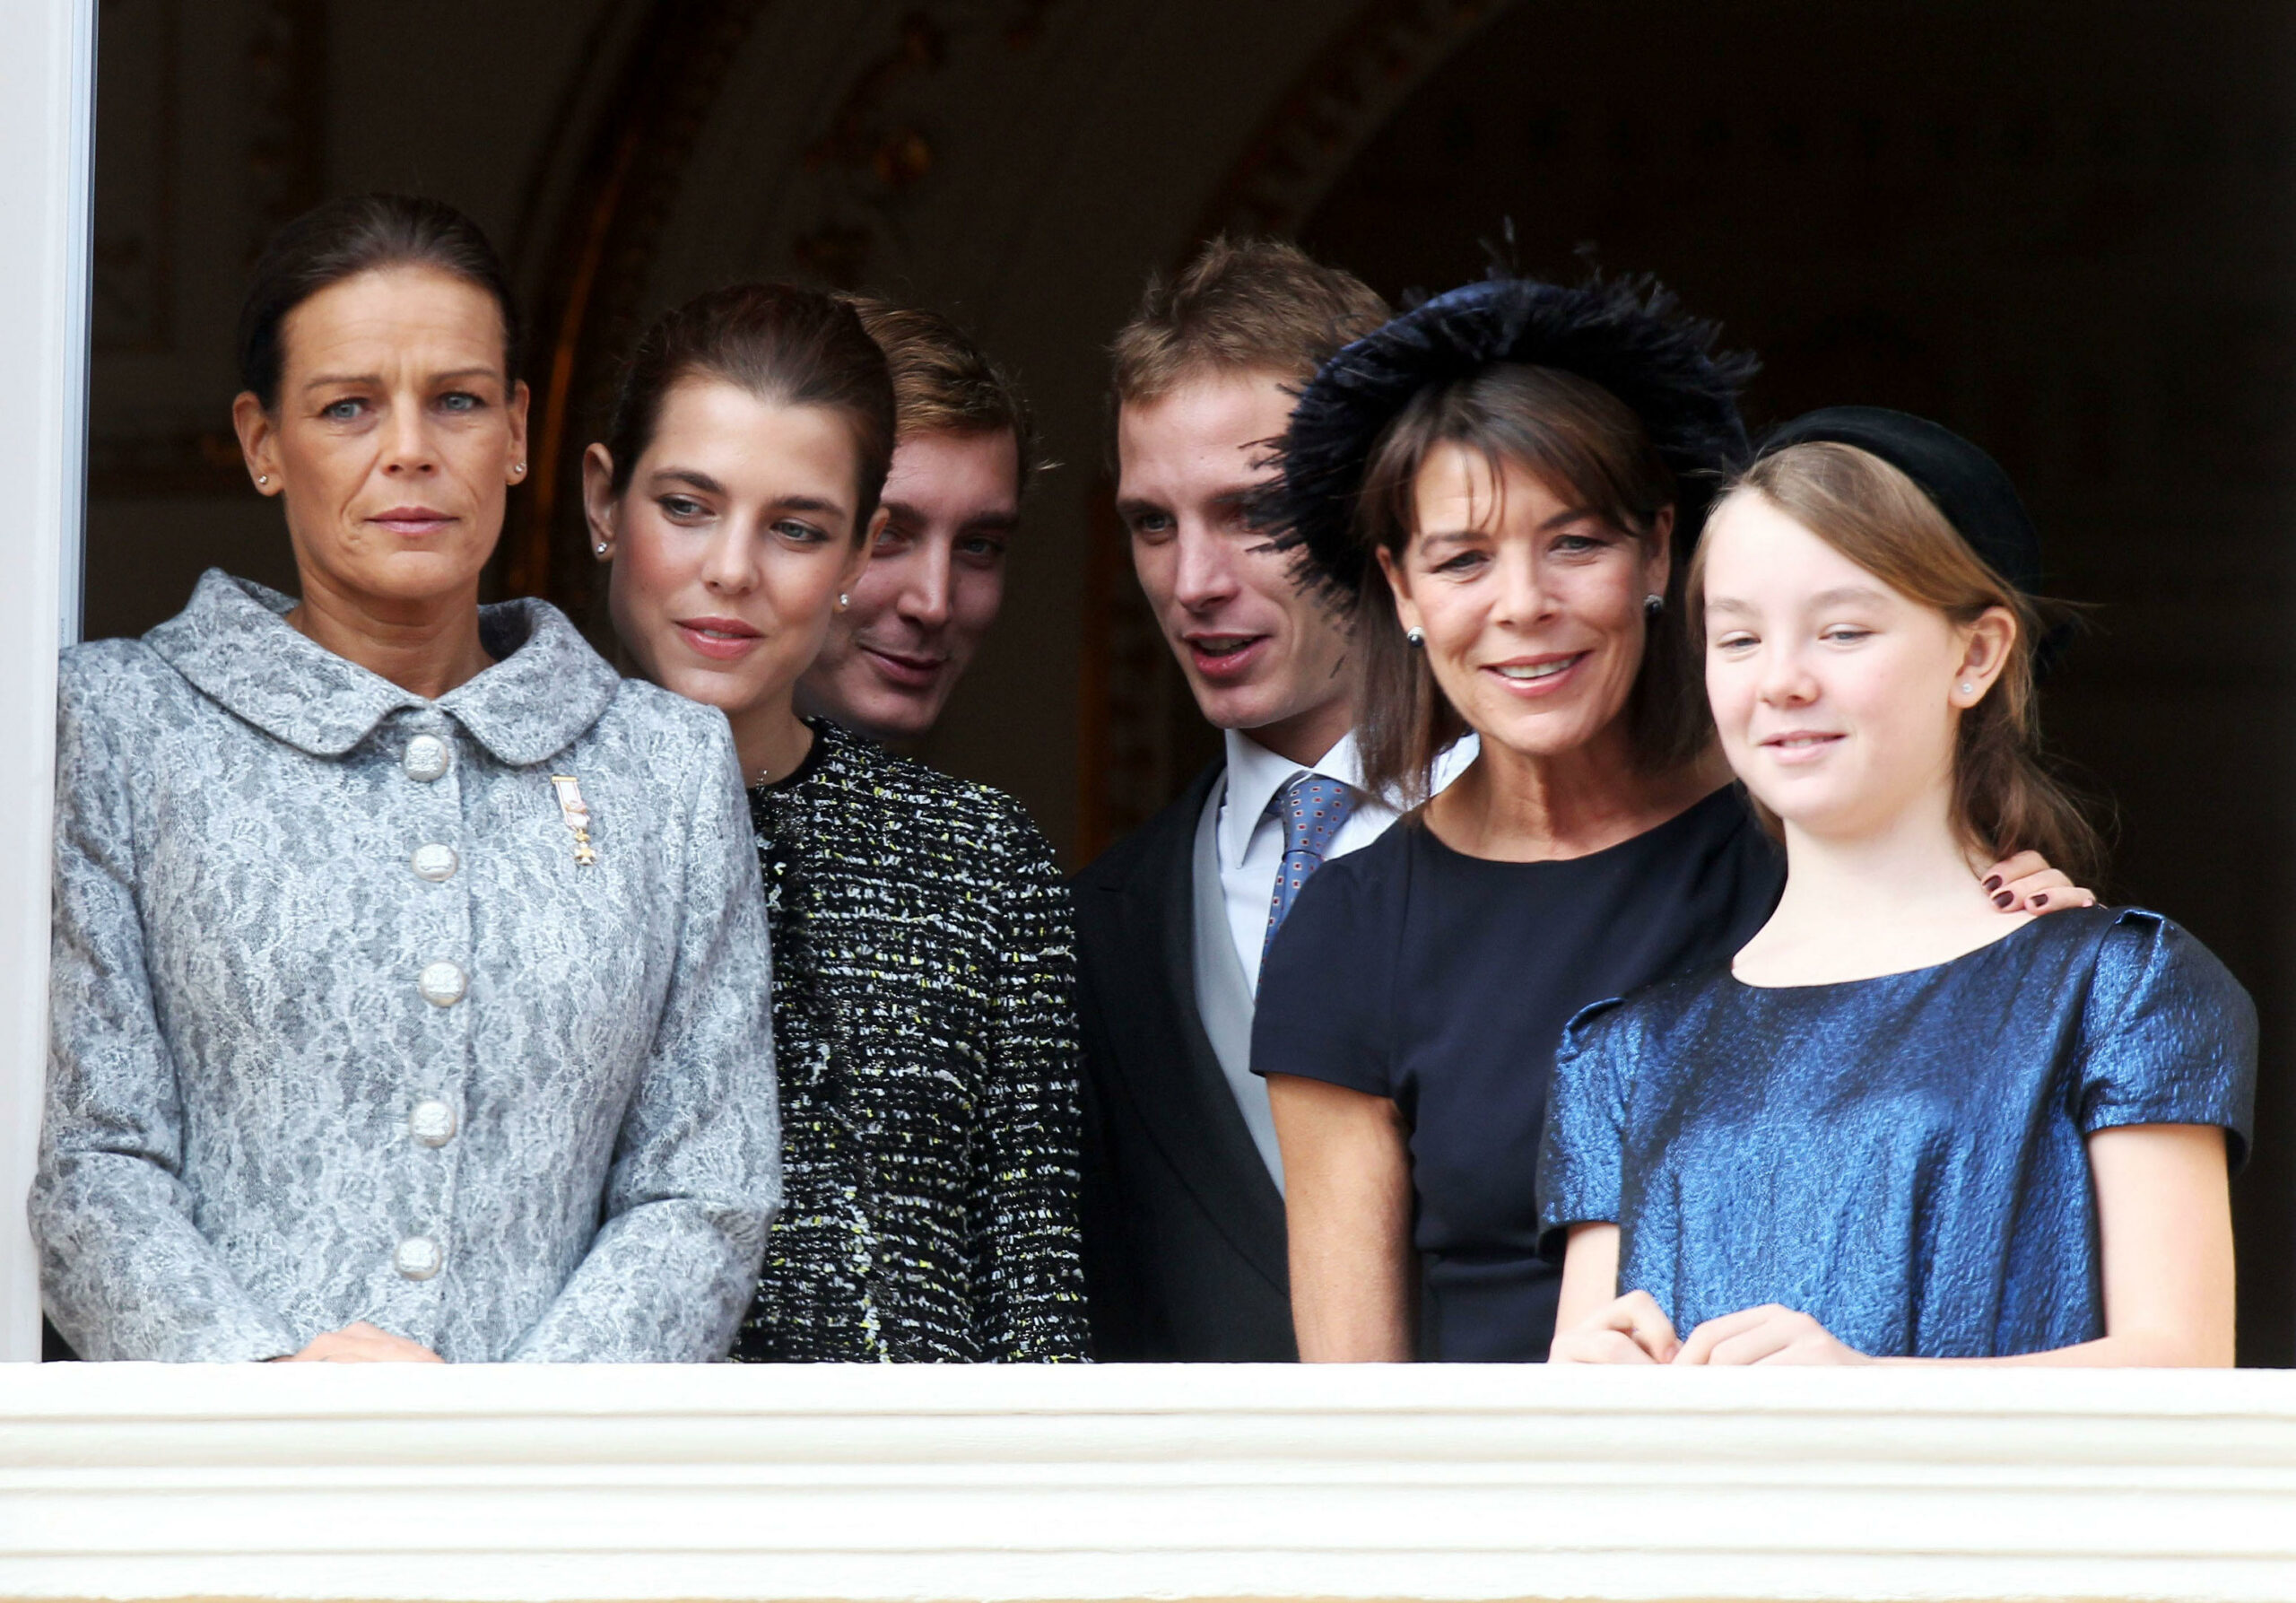 Monaco royal family food